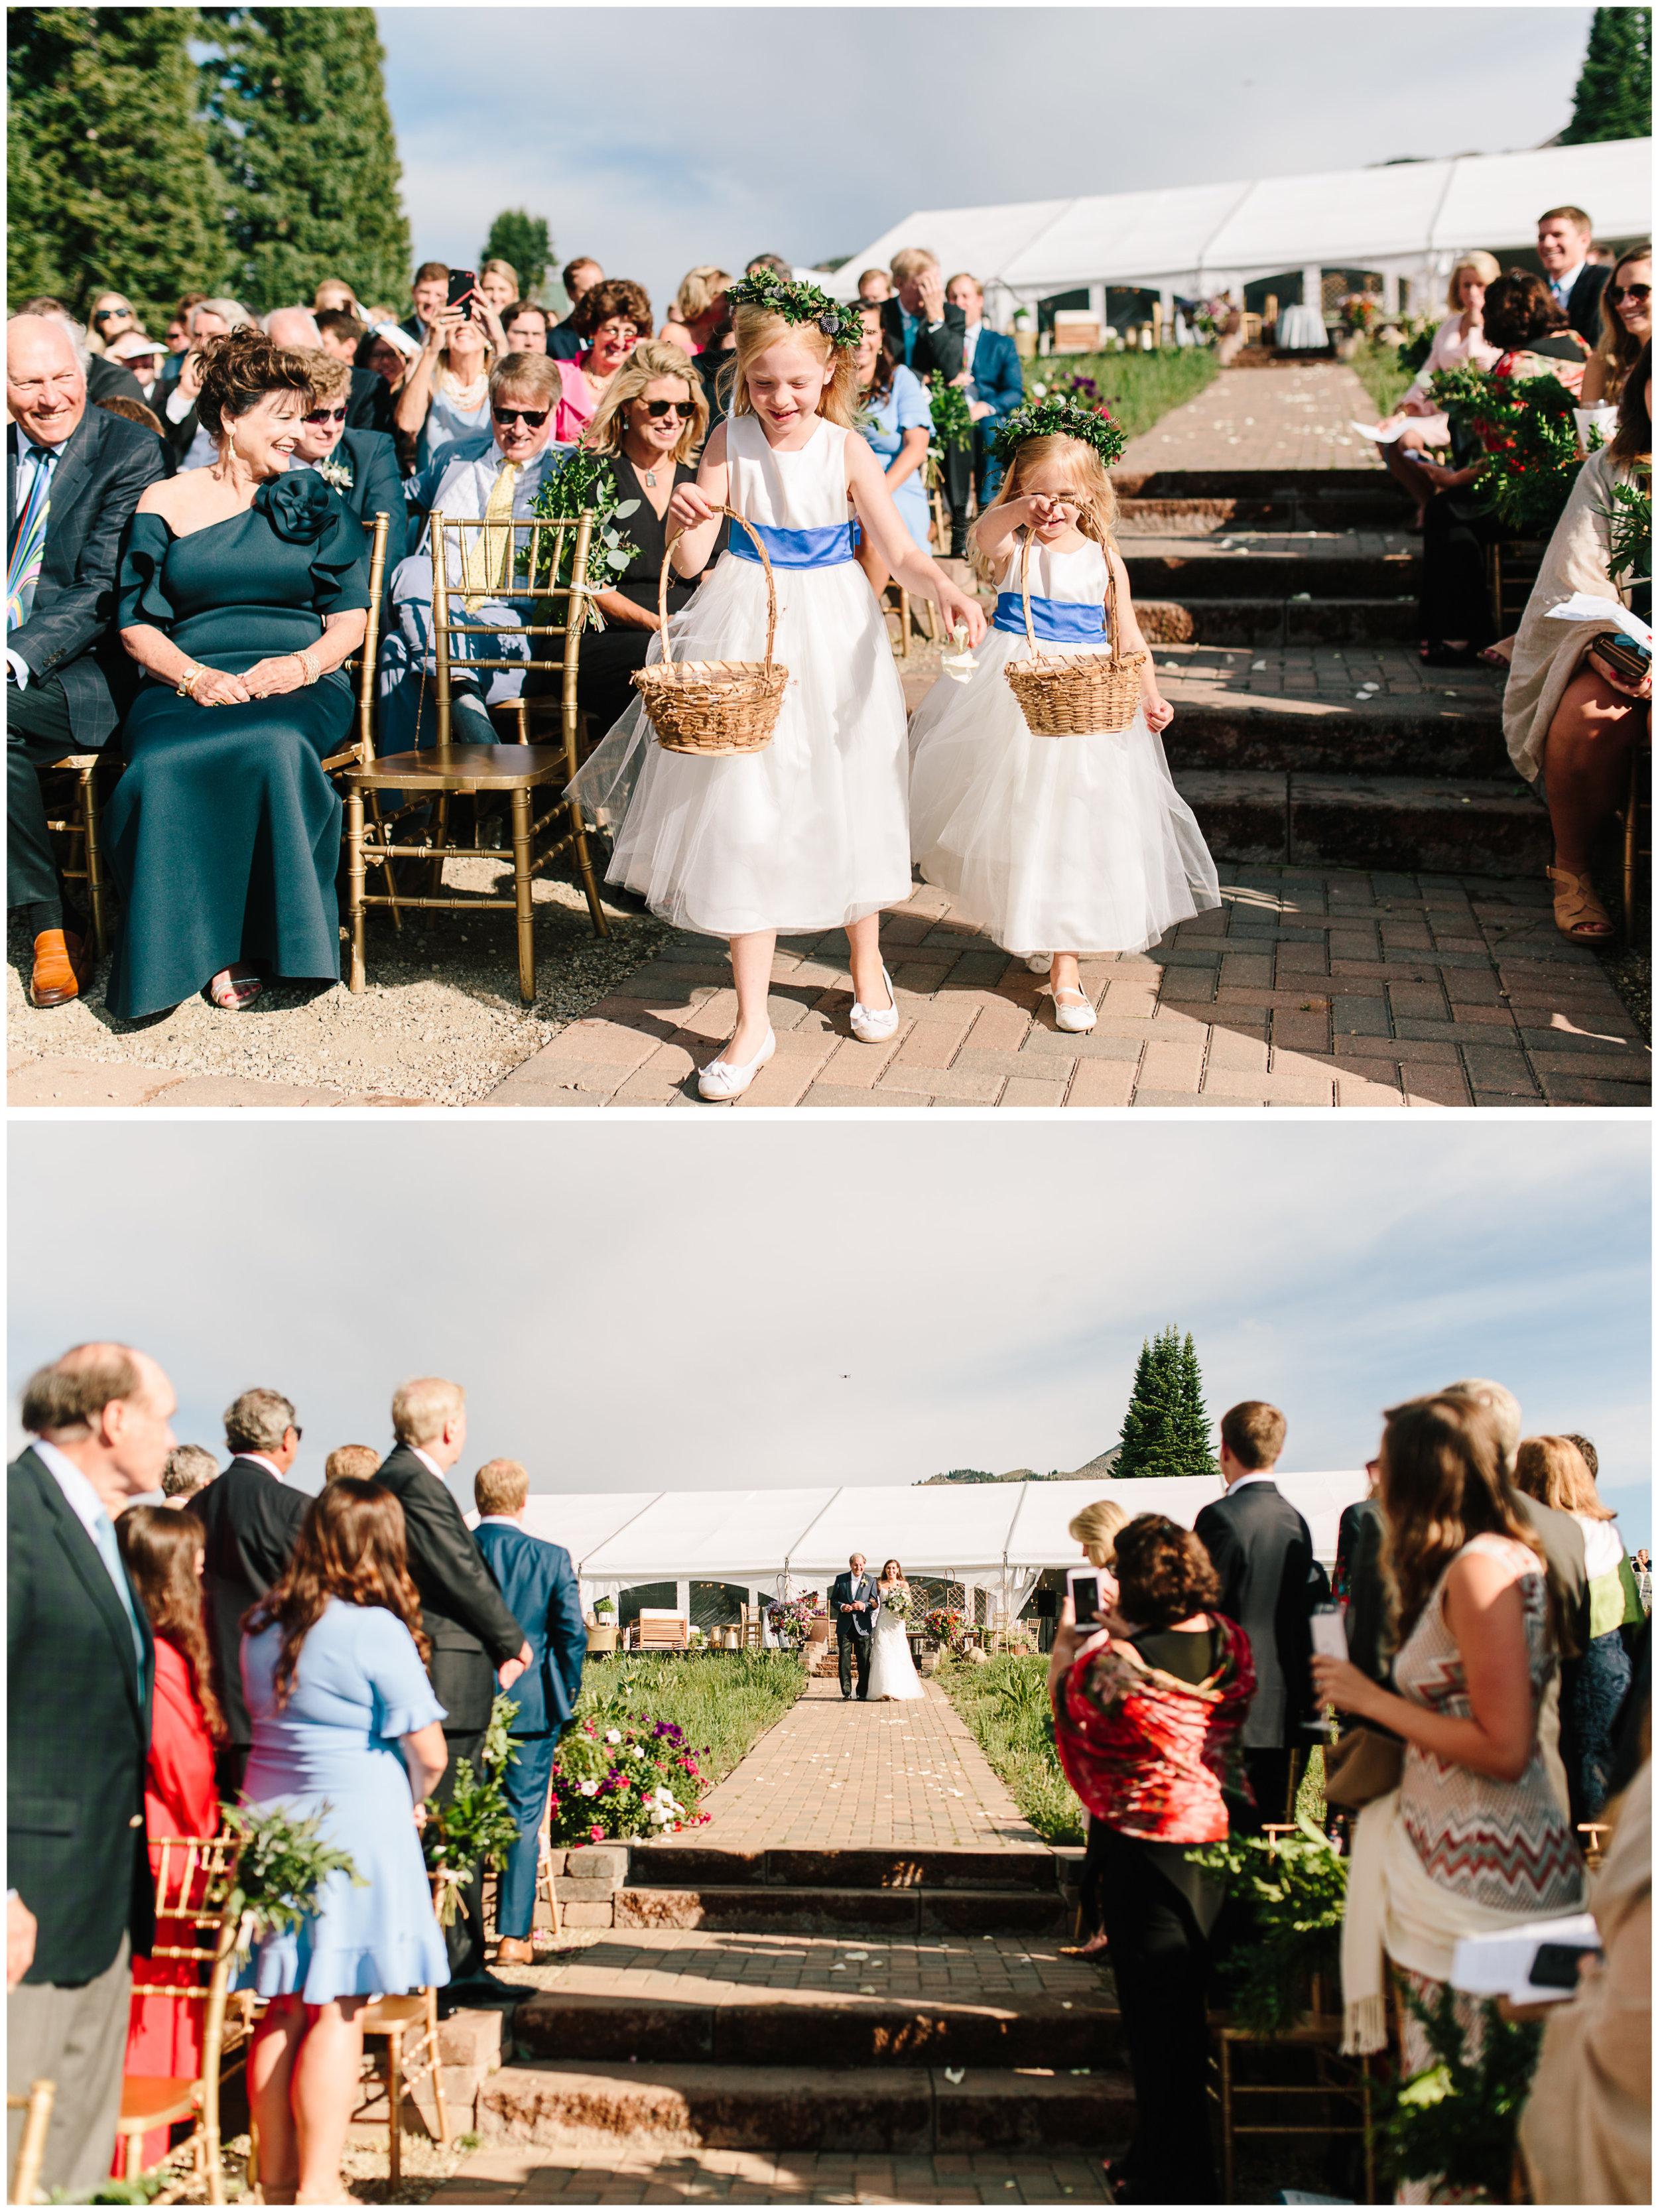 crested_butte_wedding_83.jpg